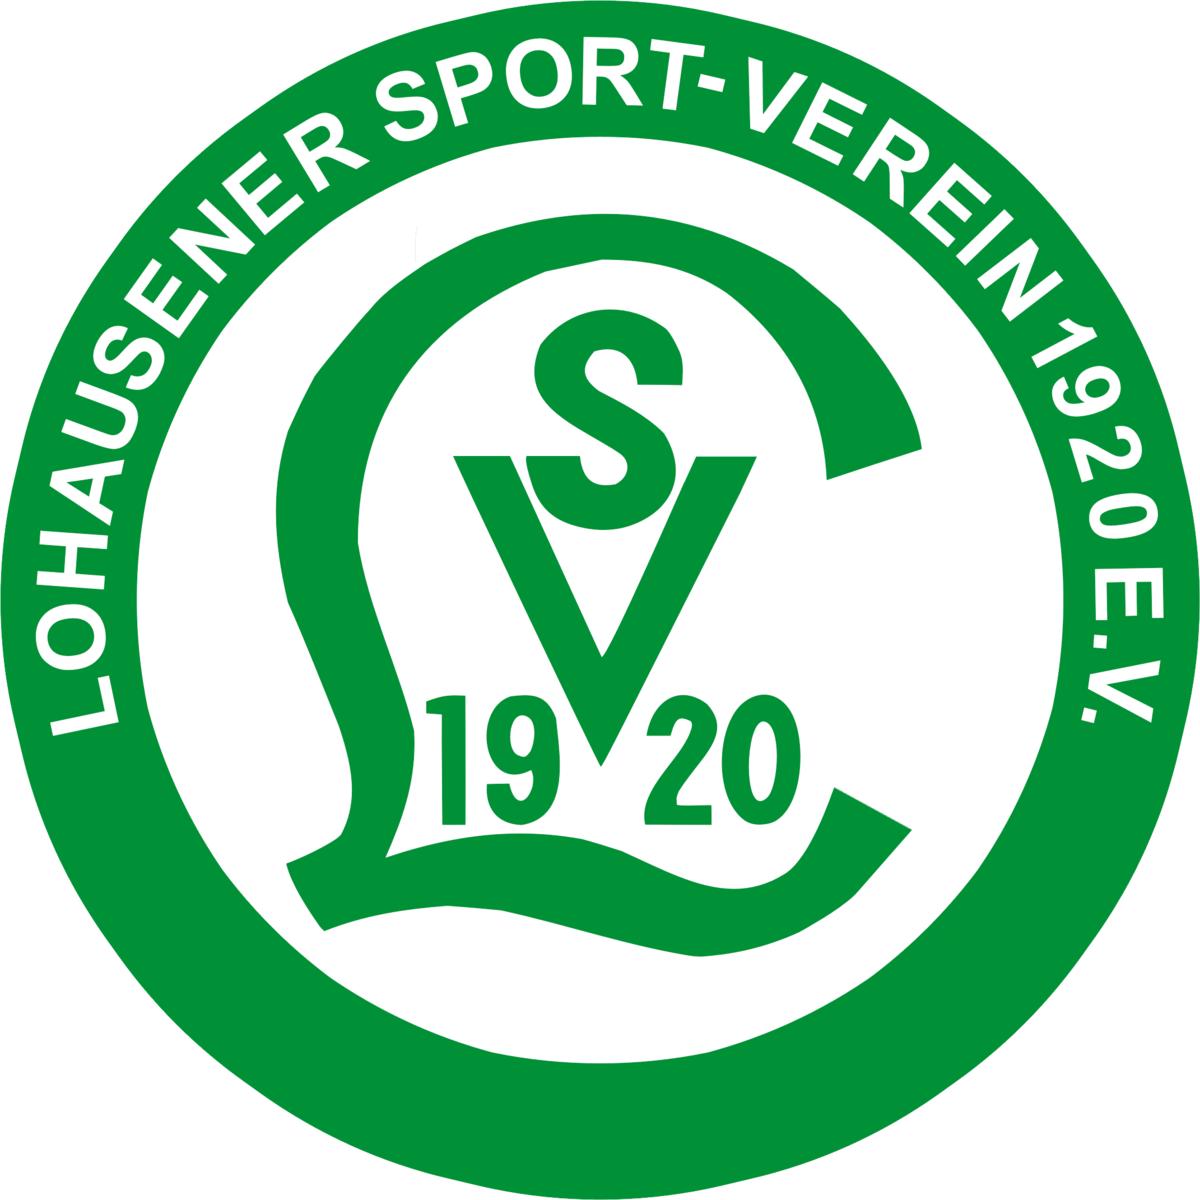 Lohausener Sv Wikipedia